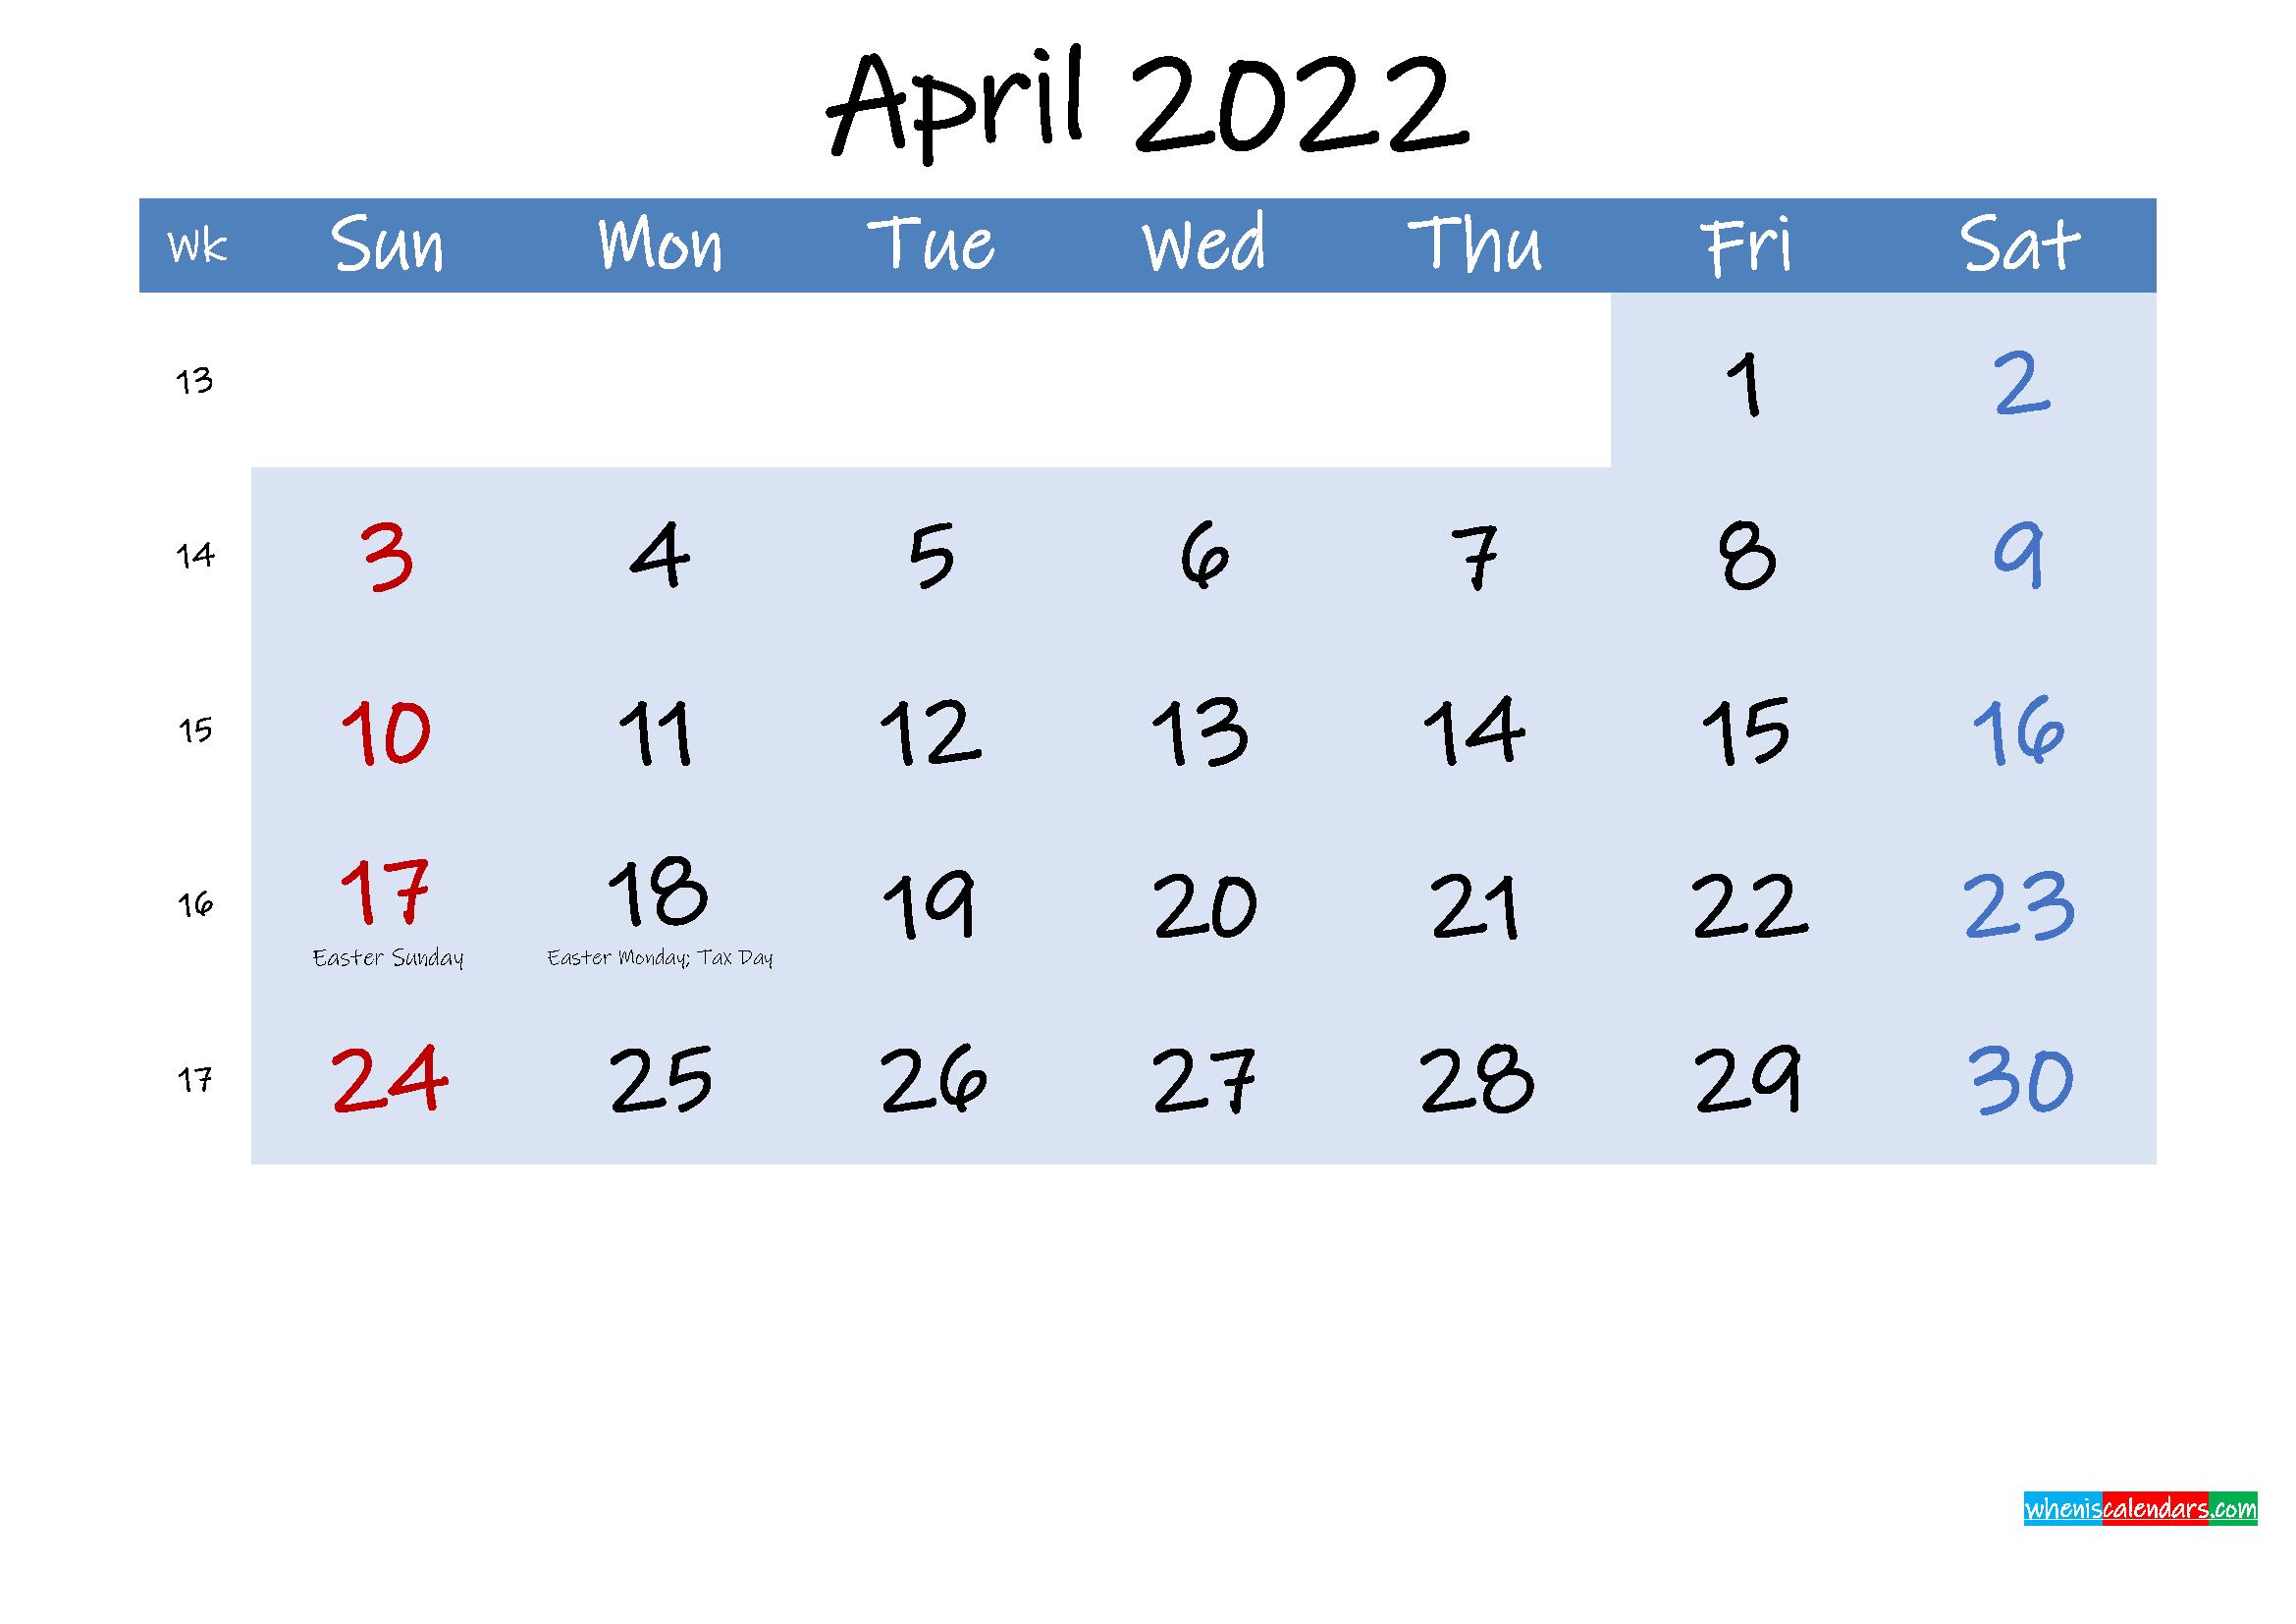 Free April 2022 Monthly Calendar Pdf - Template Ink22M184 within Printable April 2022 Calendar